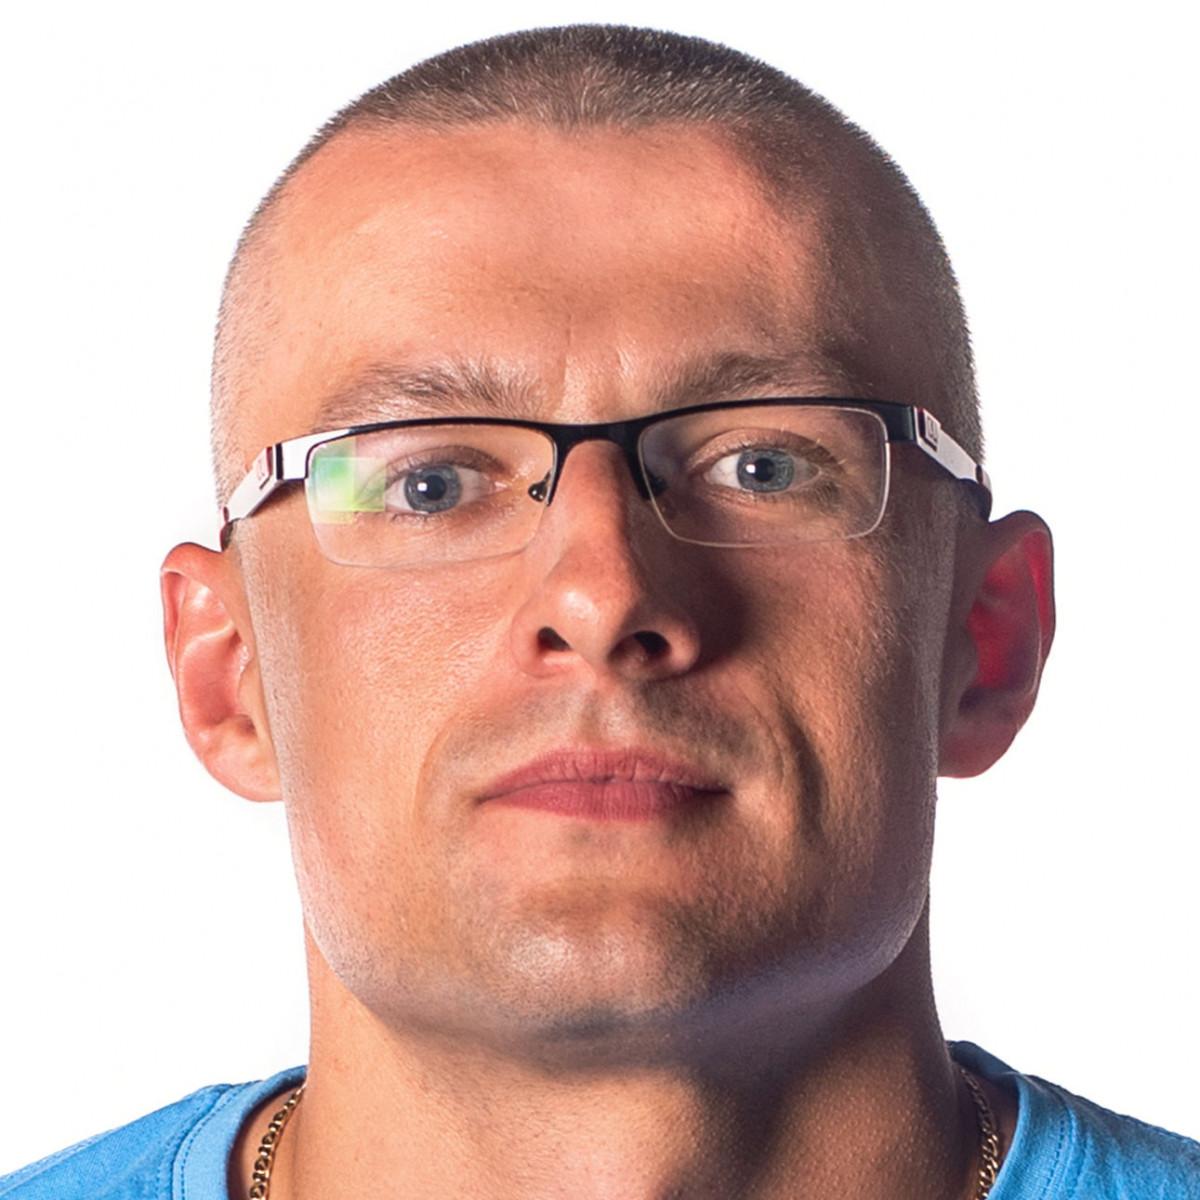 Maciej Siemienczuk